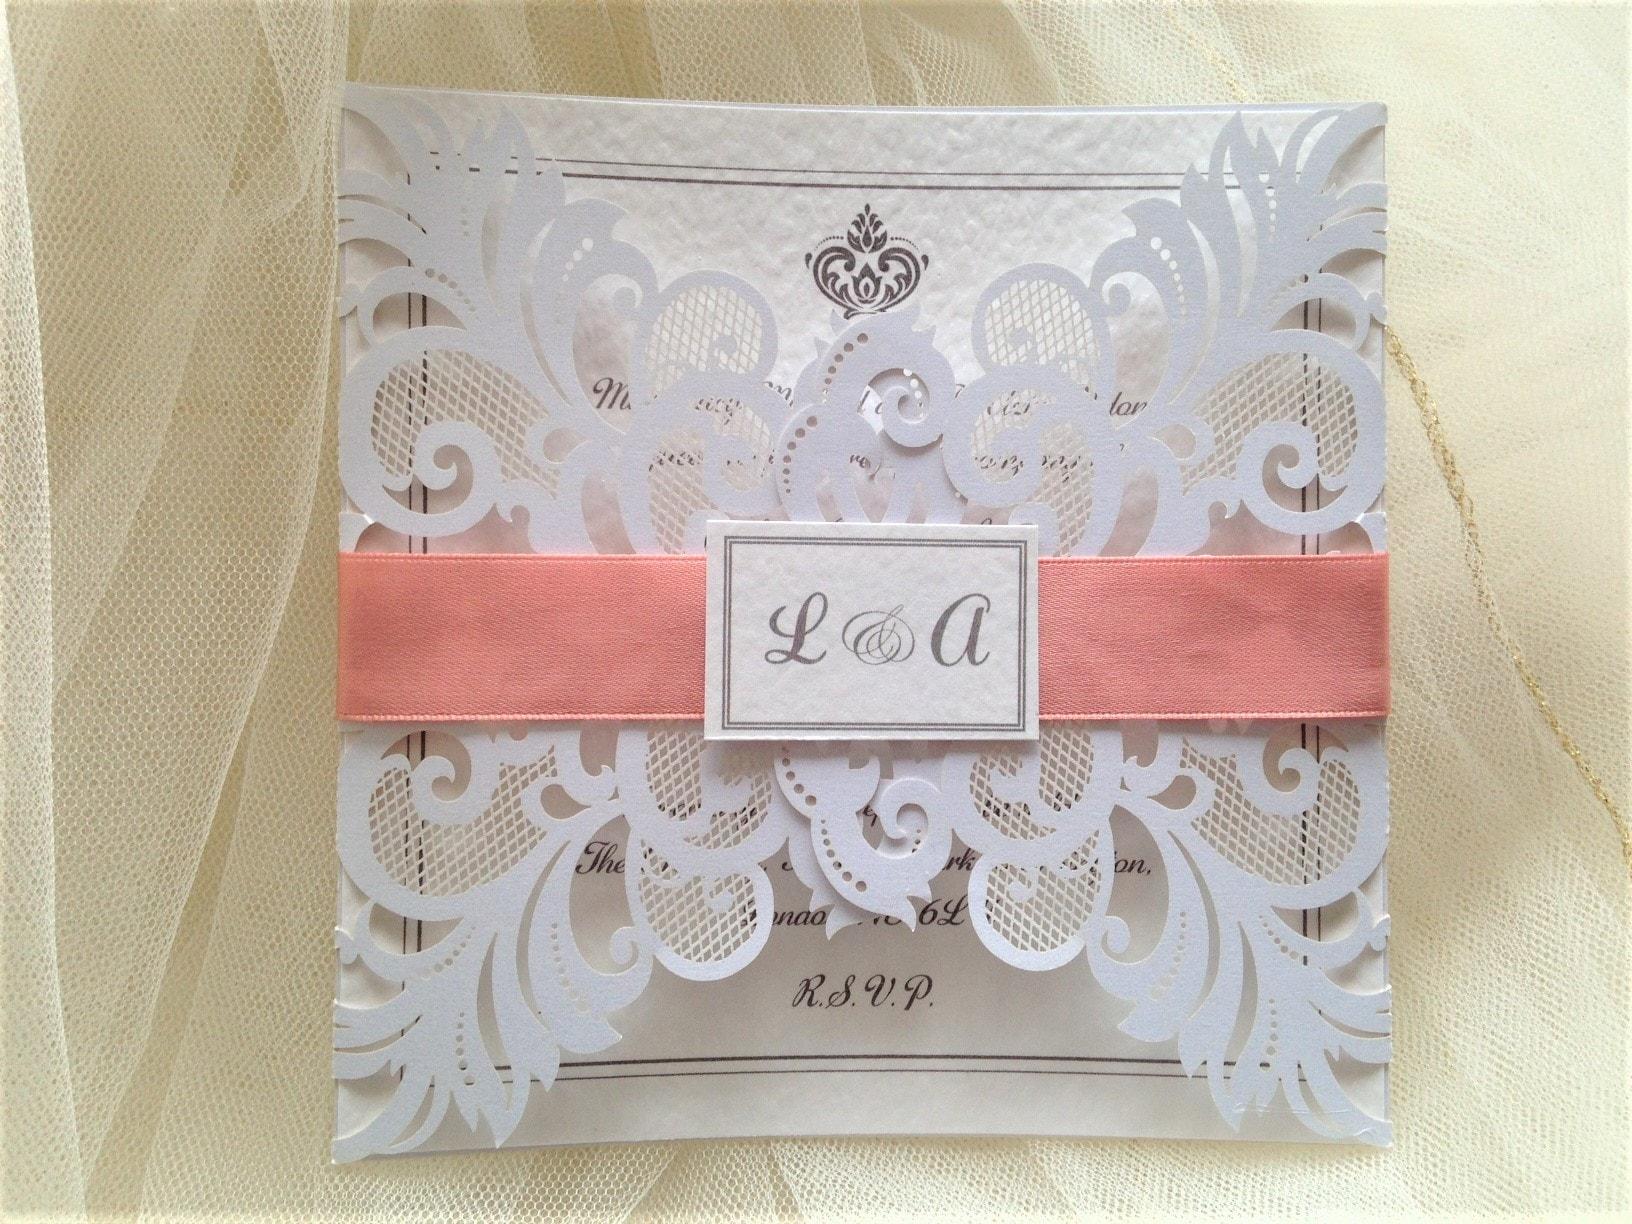 Laser Cut Out Wedding Invitations: Silver Laser Cut Wedding Invites